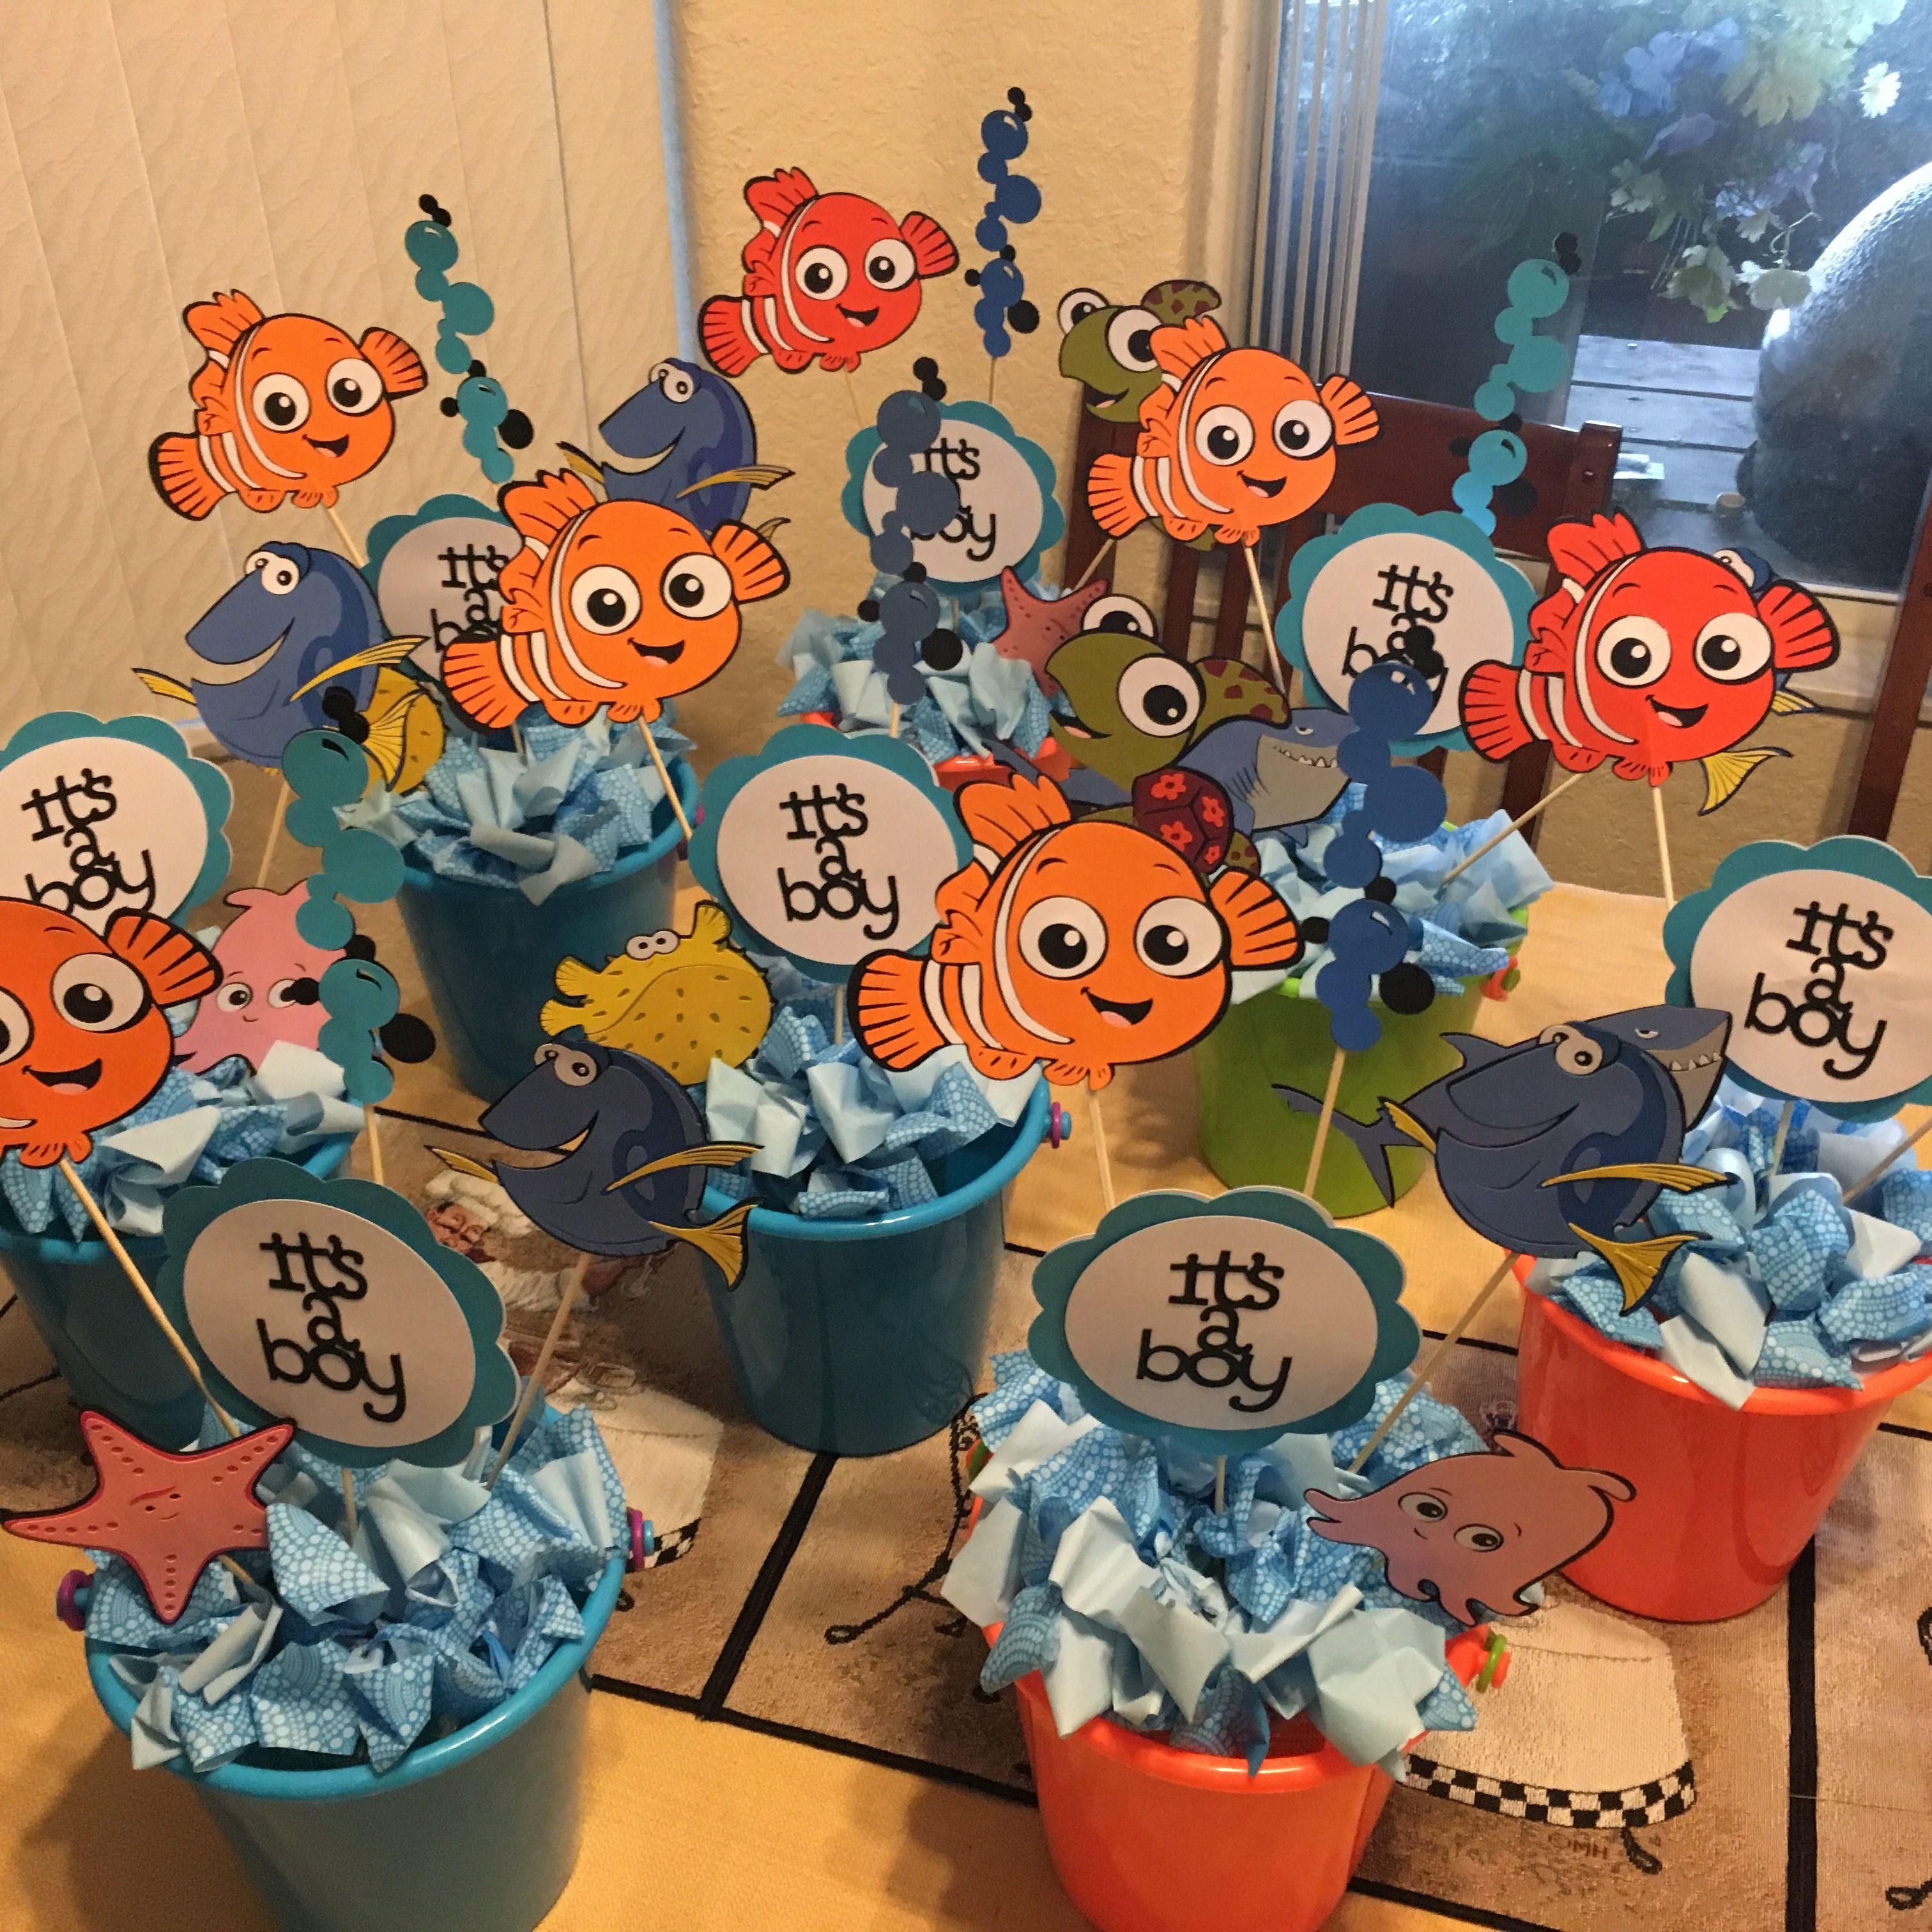 Finding Nemo Baby Shower Centerpieces. Used Cricut Best Of Pixar Cartridge.